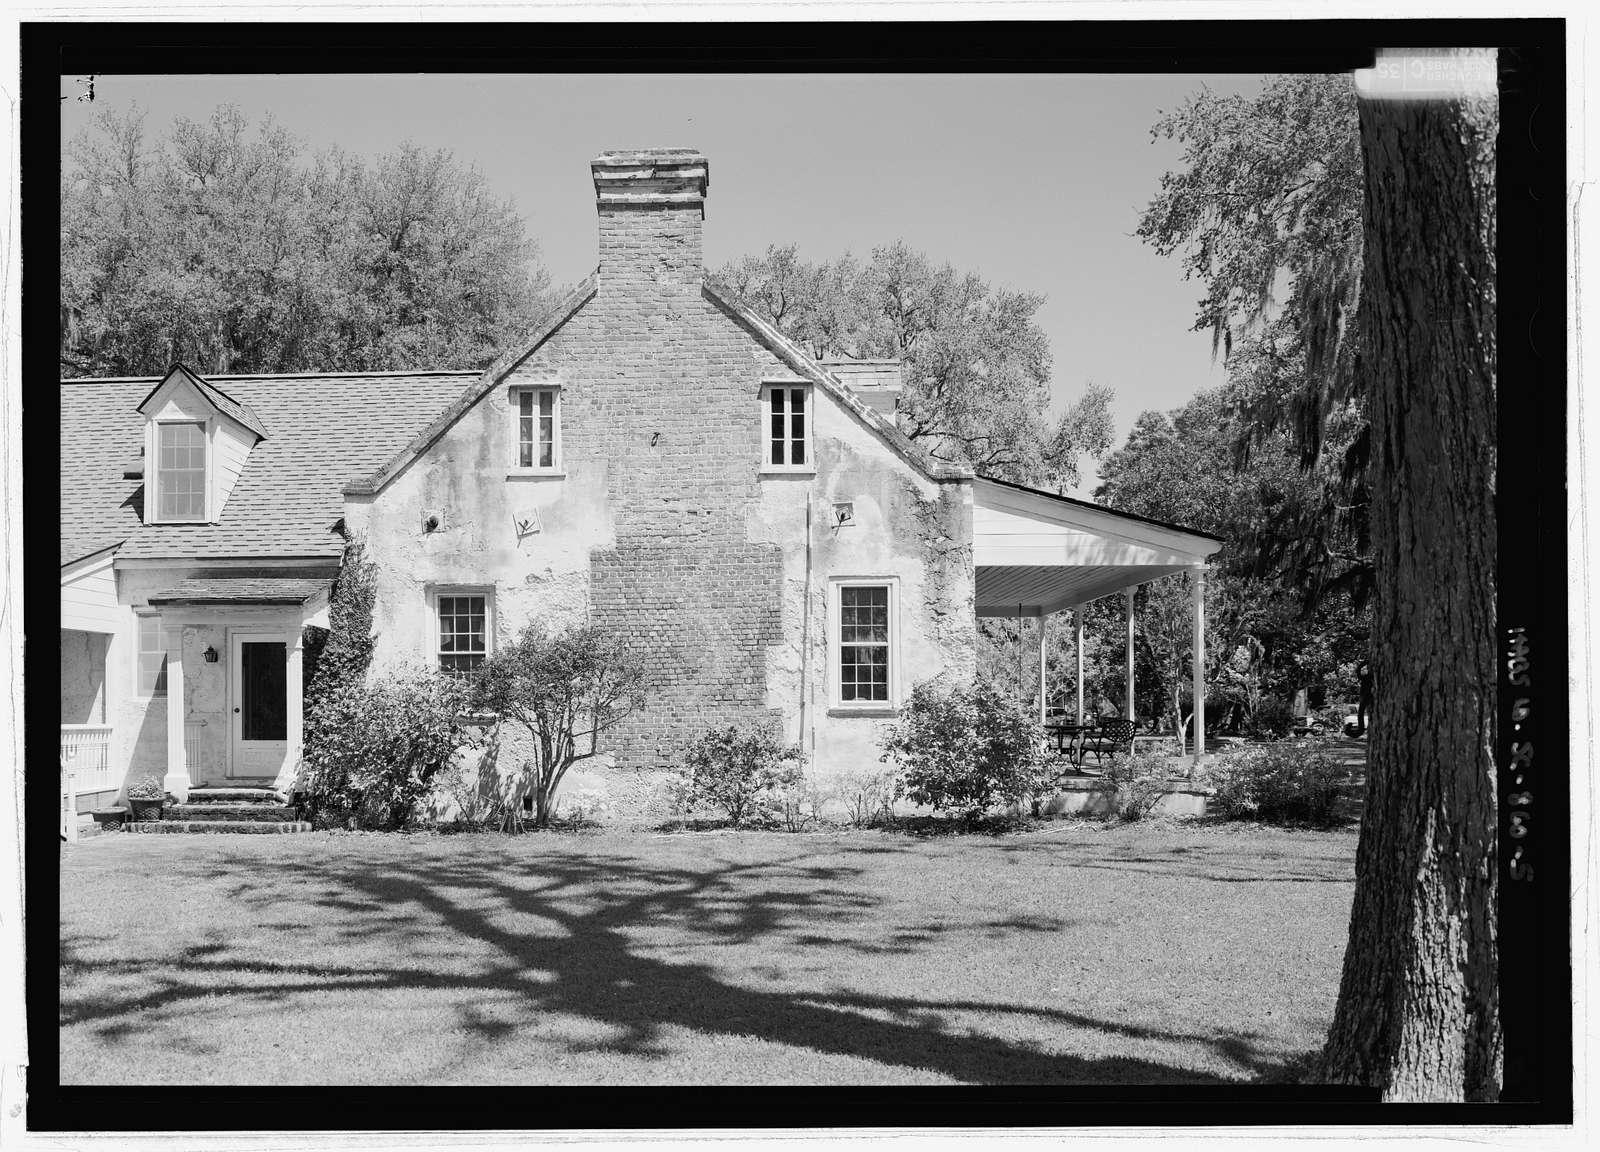 Retreat Plantation, 130 Pinckney Retreat Road, Beaufort, Beaufort County, SC